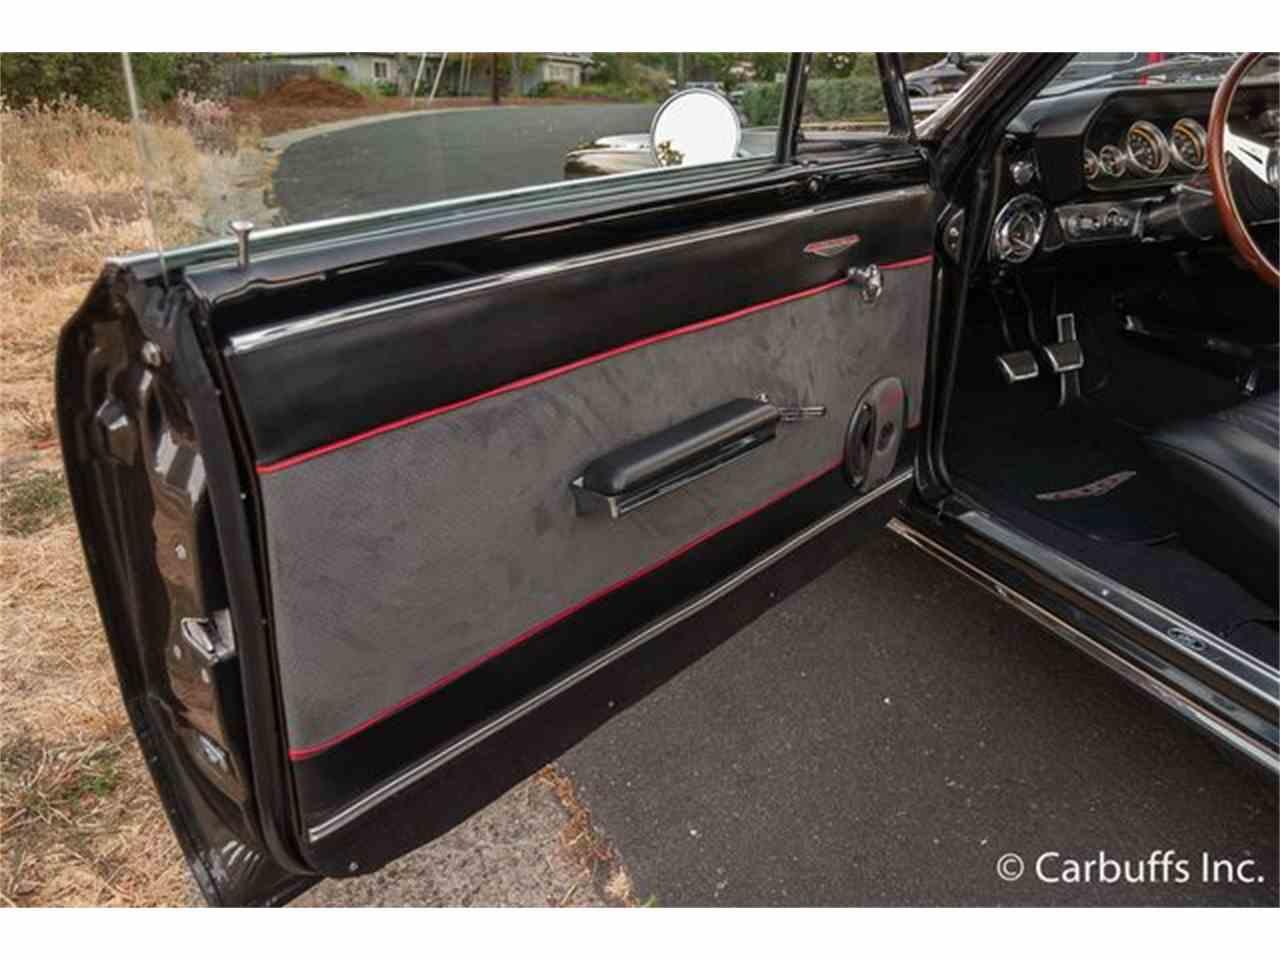 Large Picture of Classic 1965 GTO located in Concord California - $67,950.00 - LUMM